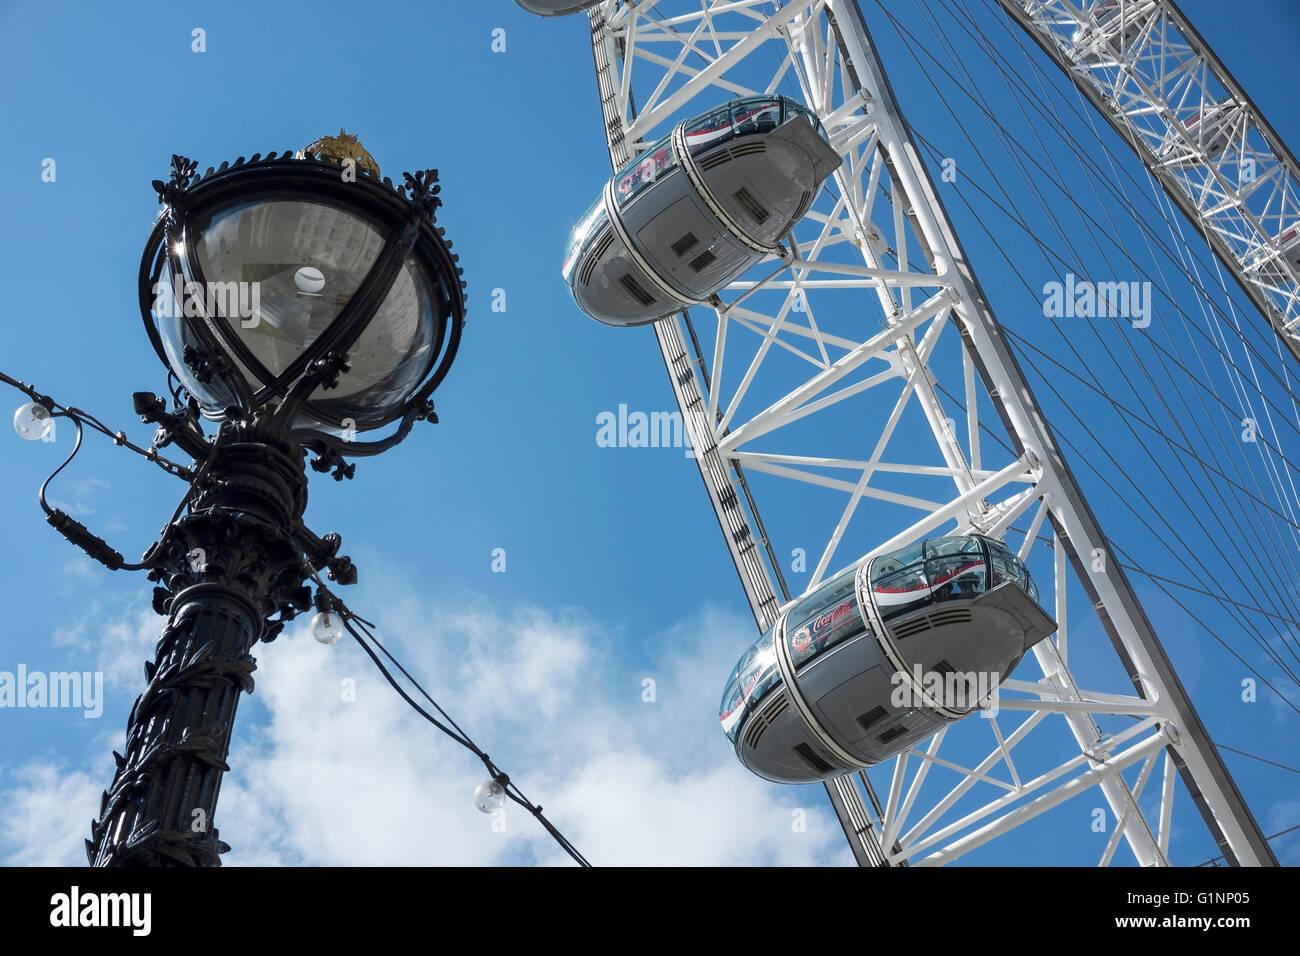 Close up detail of the London Eye, London UK - Stock Image